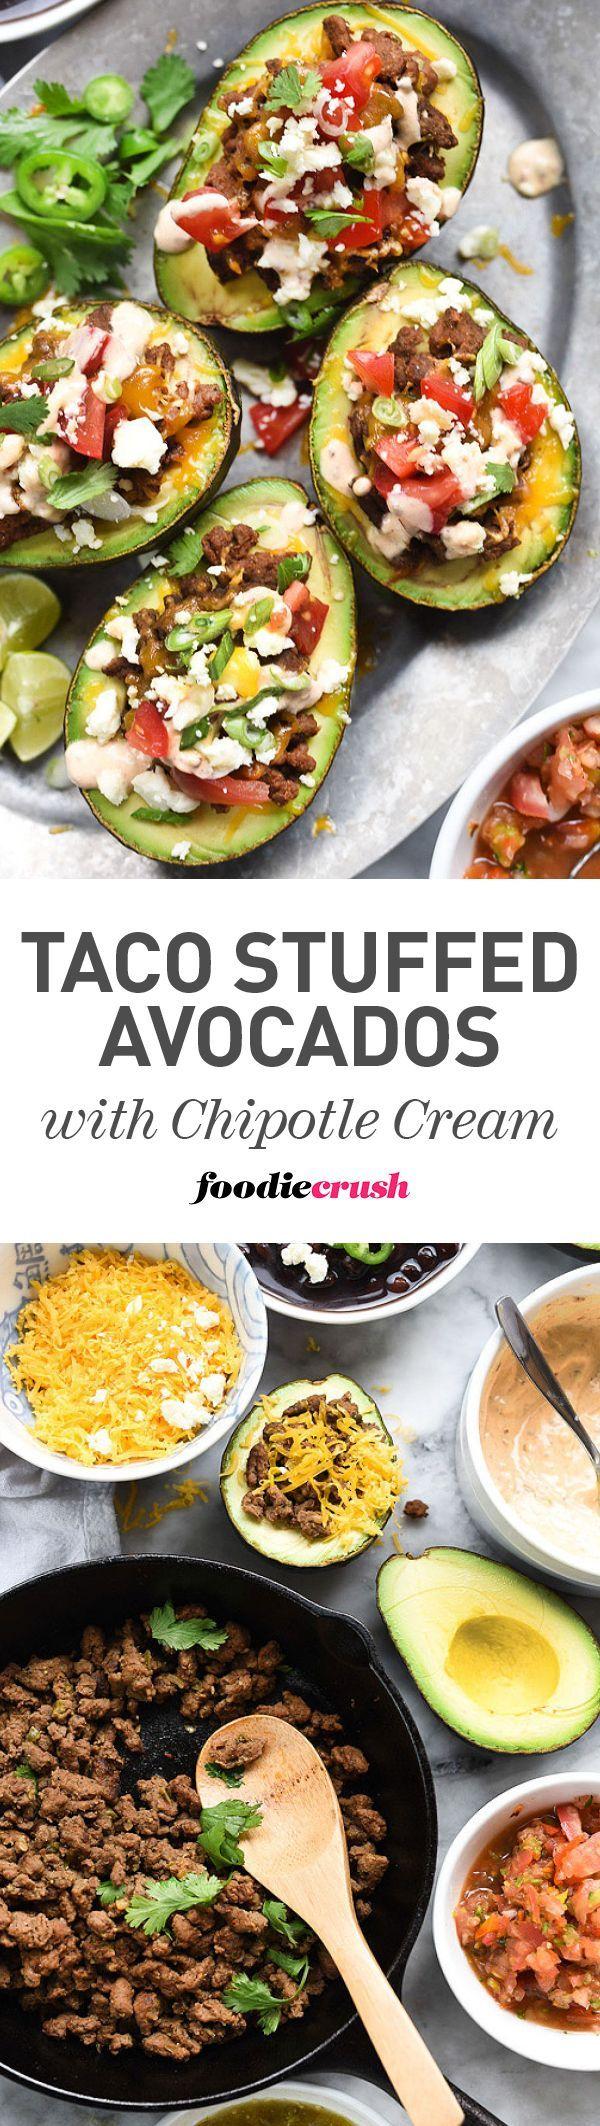 Taco Stuffed Avocados with Chipotle Cream | foodiecrush.com